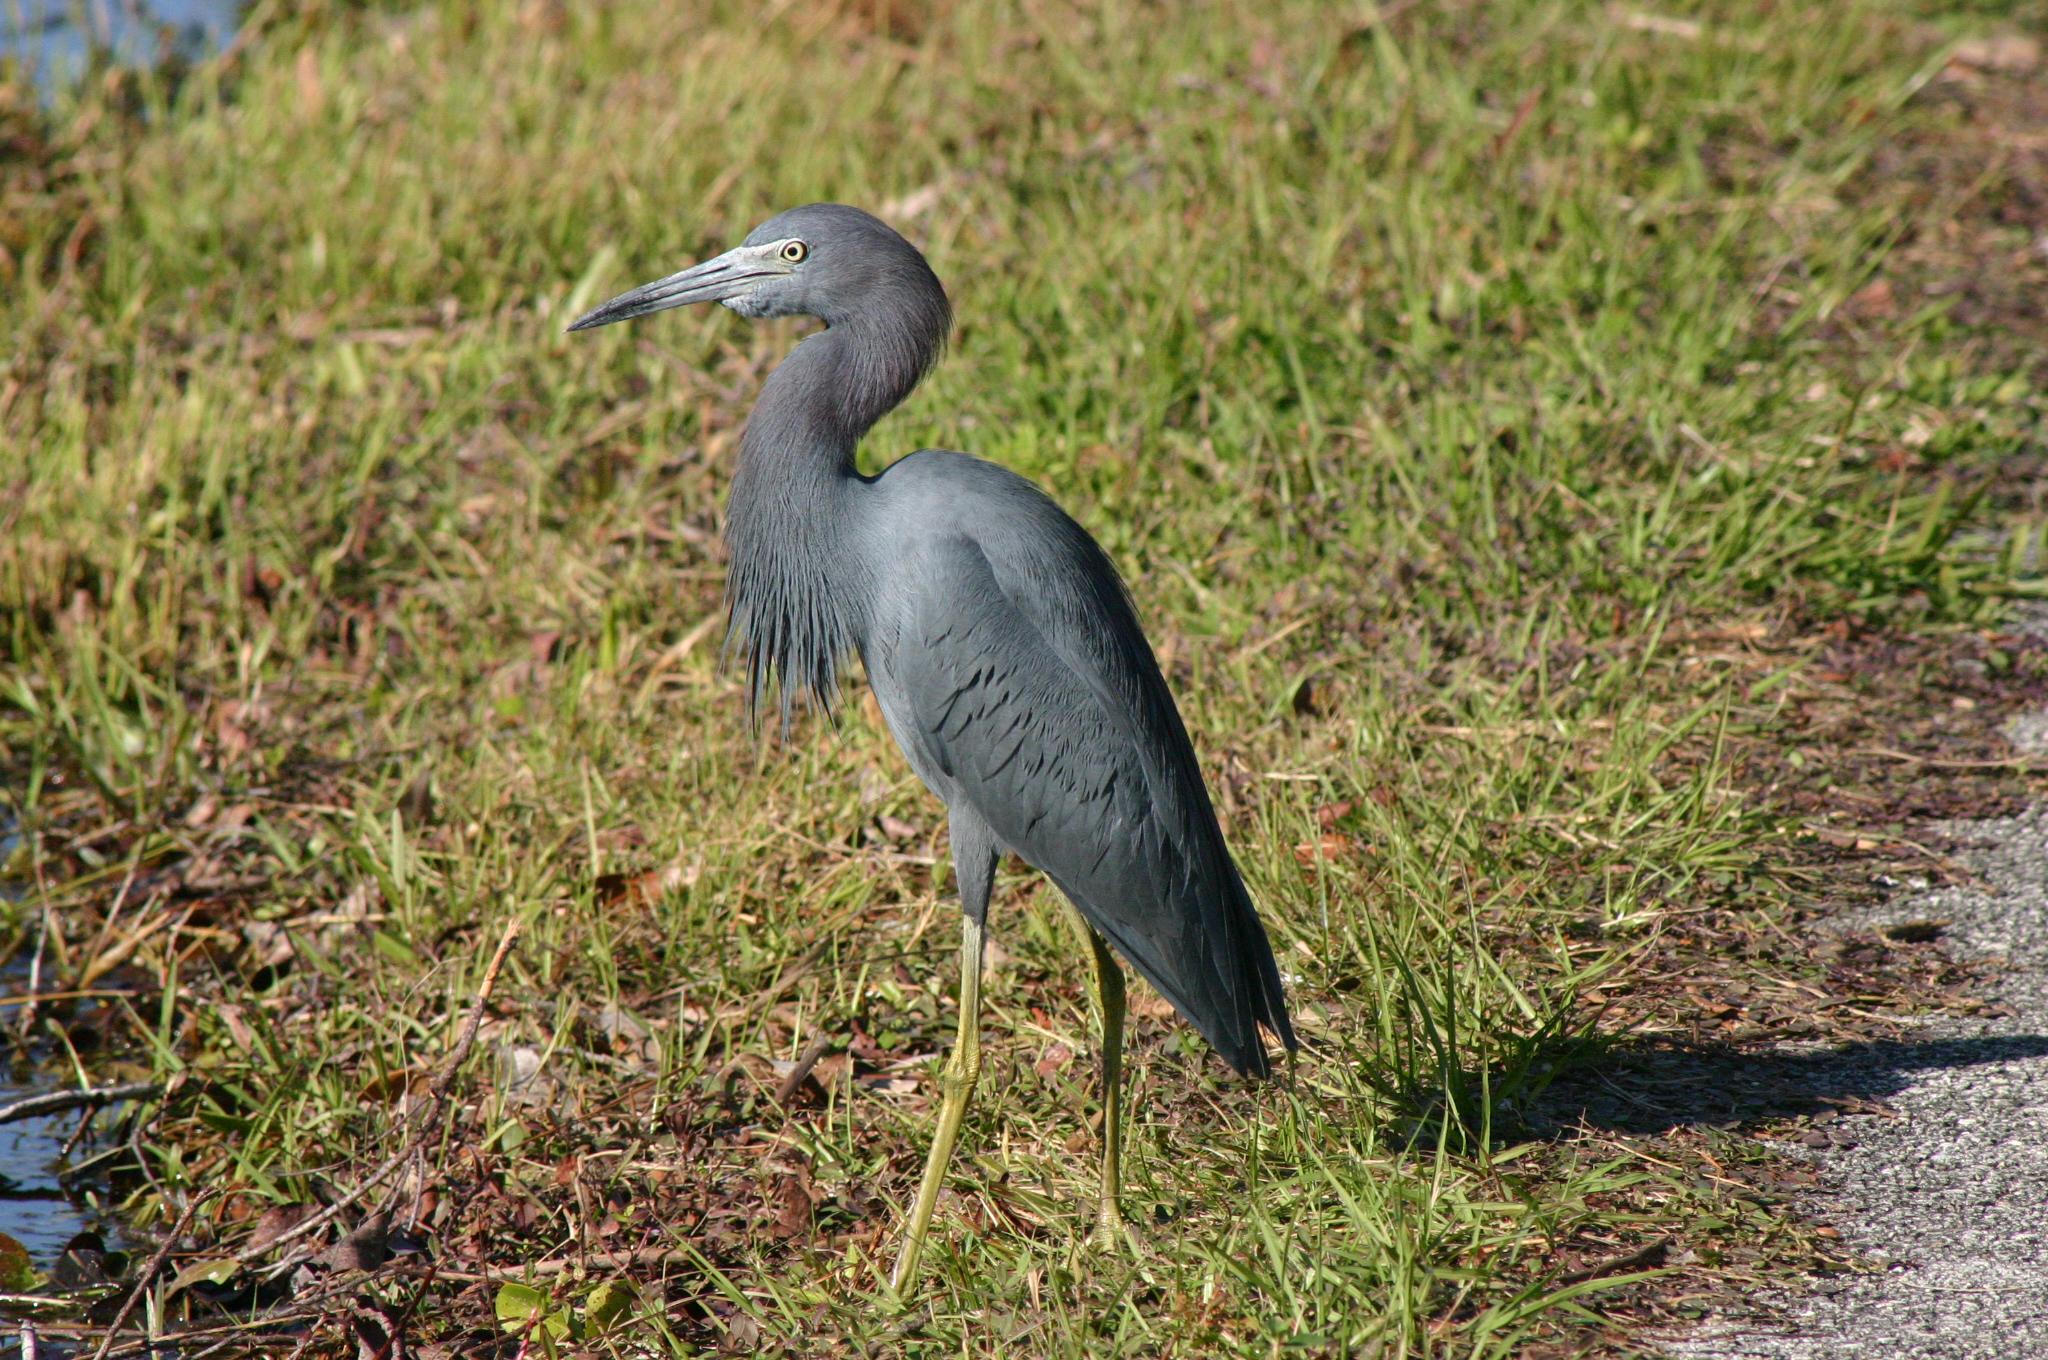 File:Nonbreeding Adult Little Blue Heron.jpg